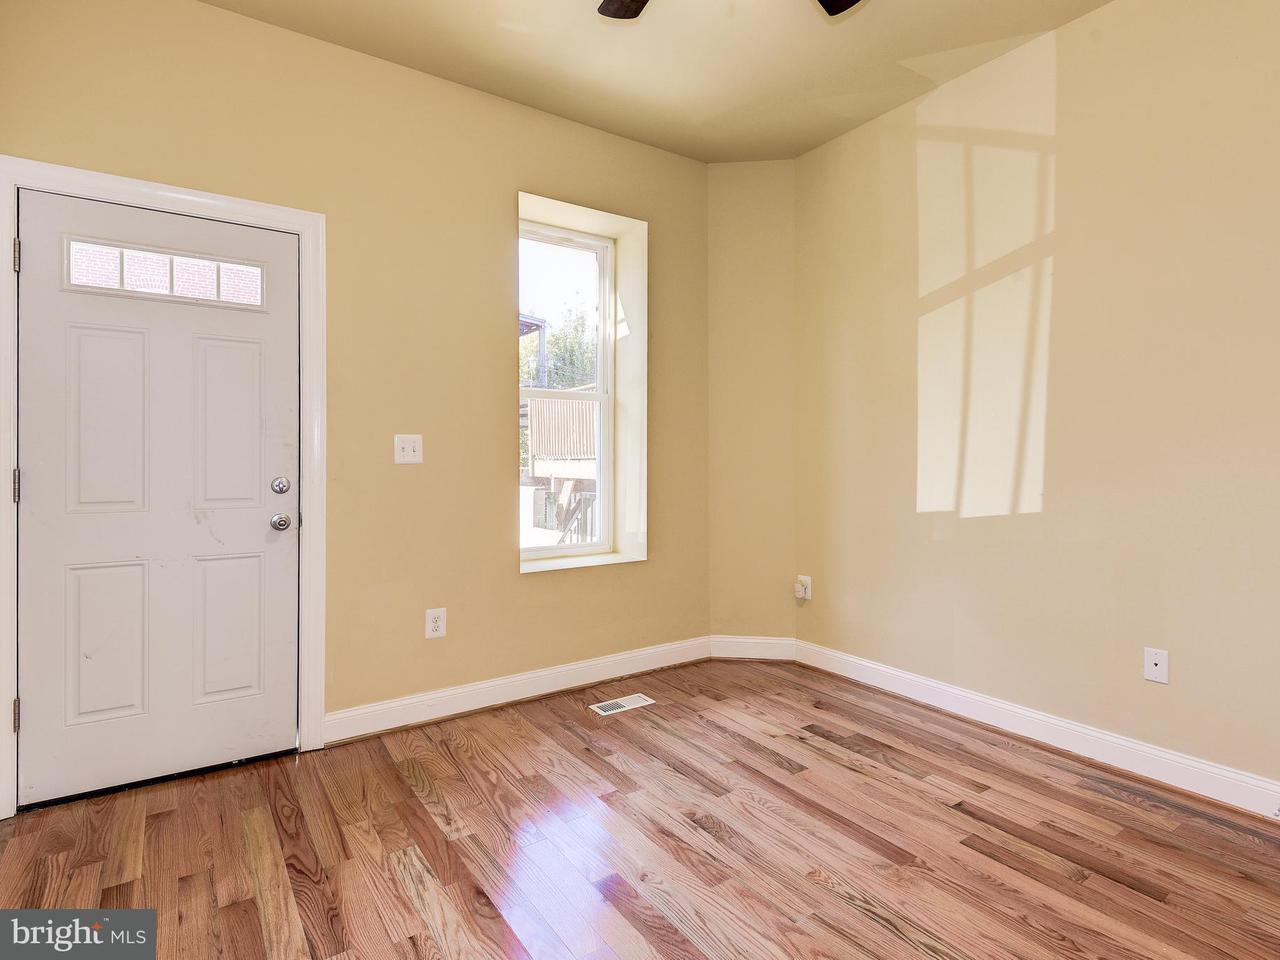 Additional photo for property listing at 1926 1st St Nw #2 1926 1st St Nw #2 Washington, コロンビア特別区 20001 アメリカ合衆国